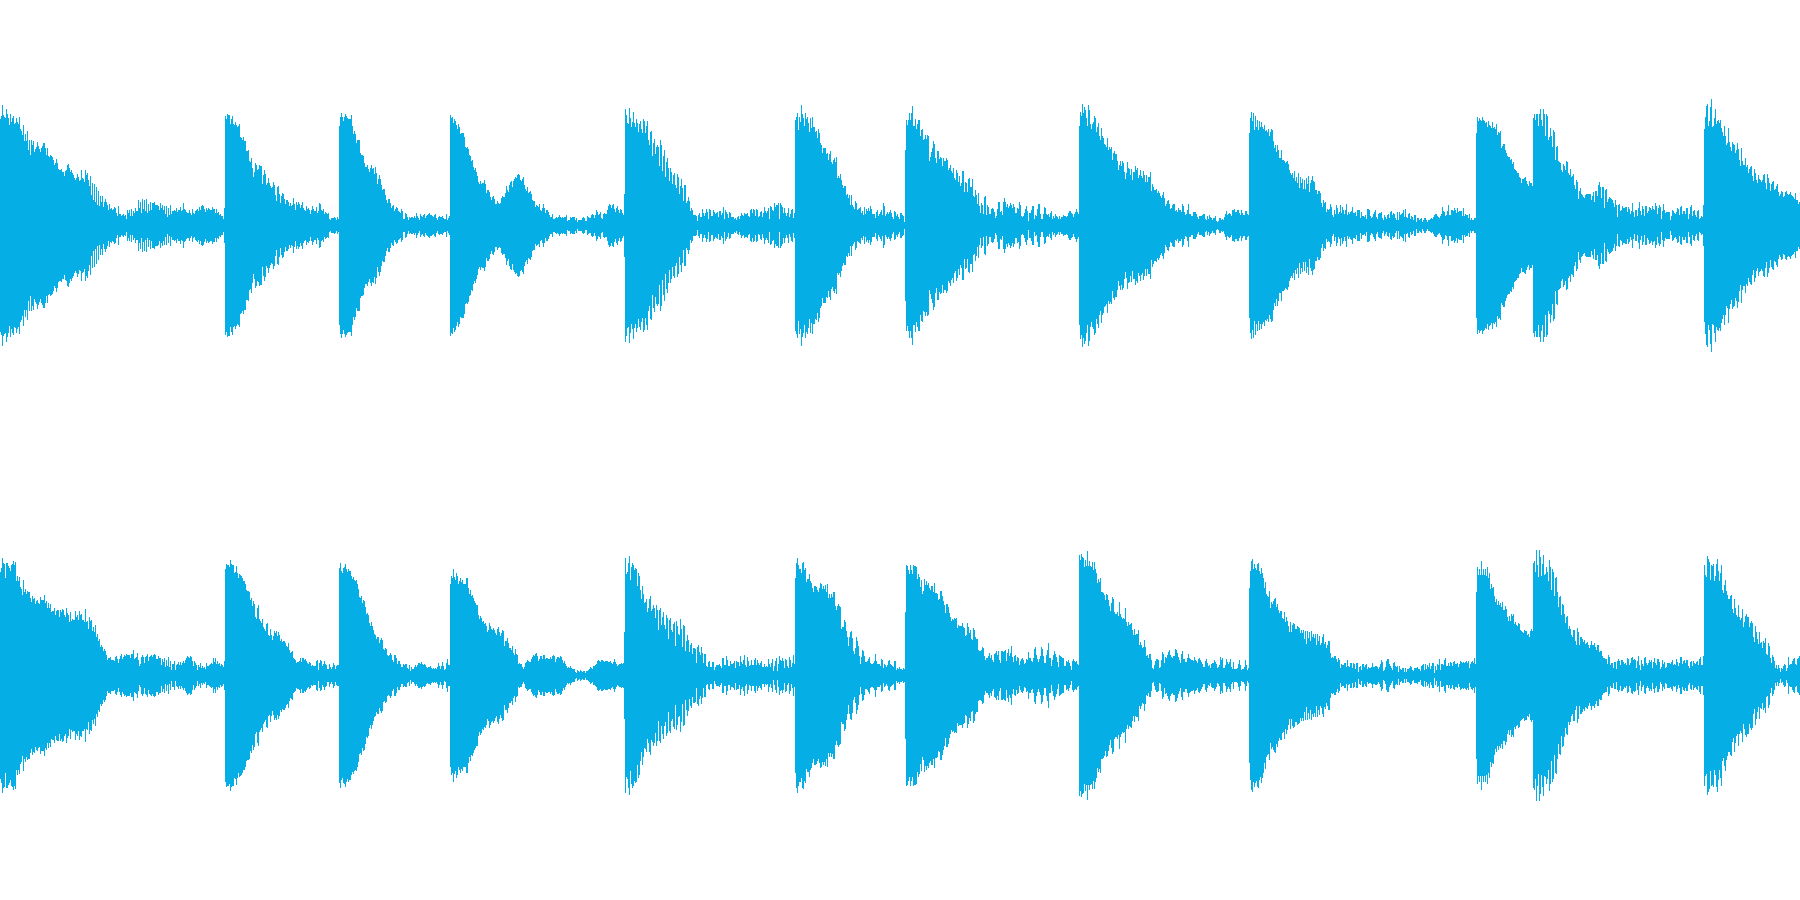 EDM PluckLoop2 音楽制作用の再生済みの波形